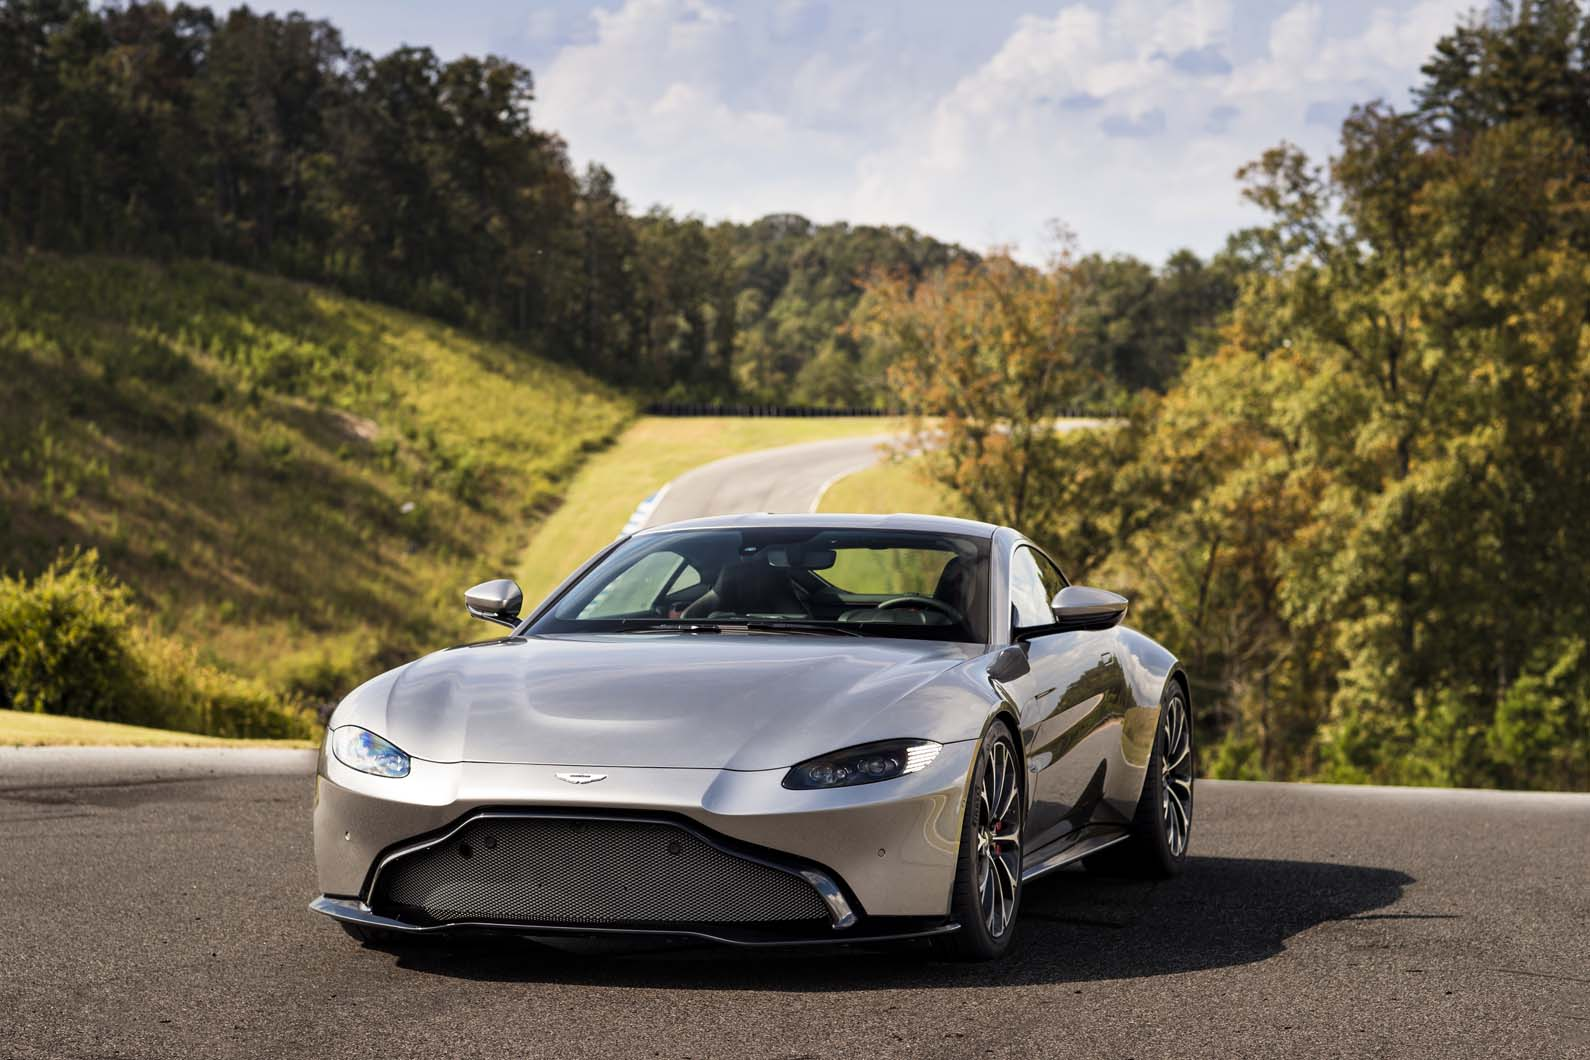 will the new aston martin vantage justify its price? | autocar